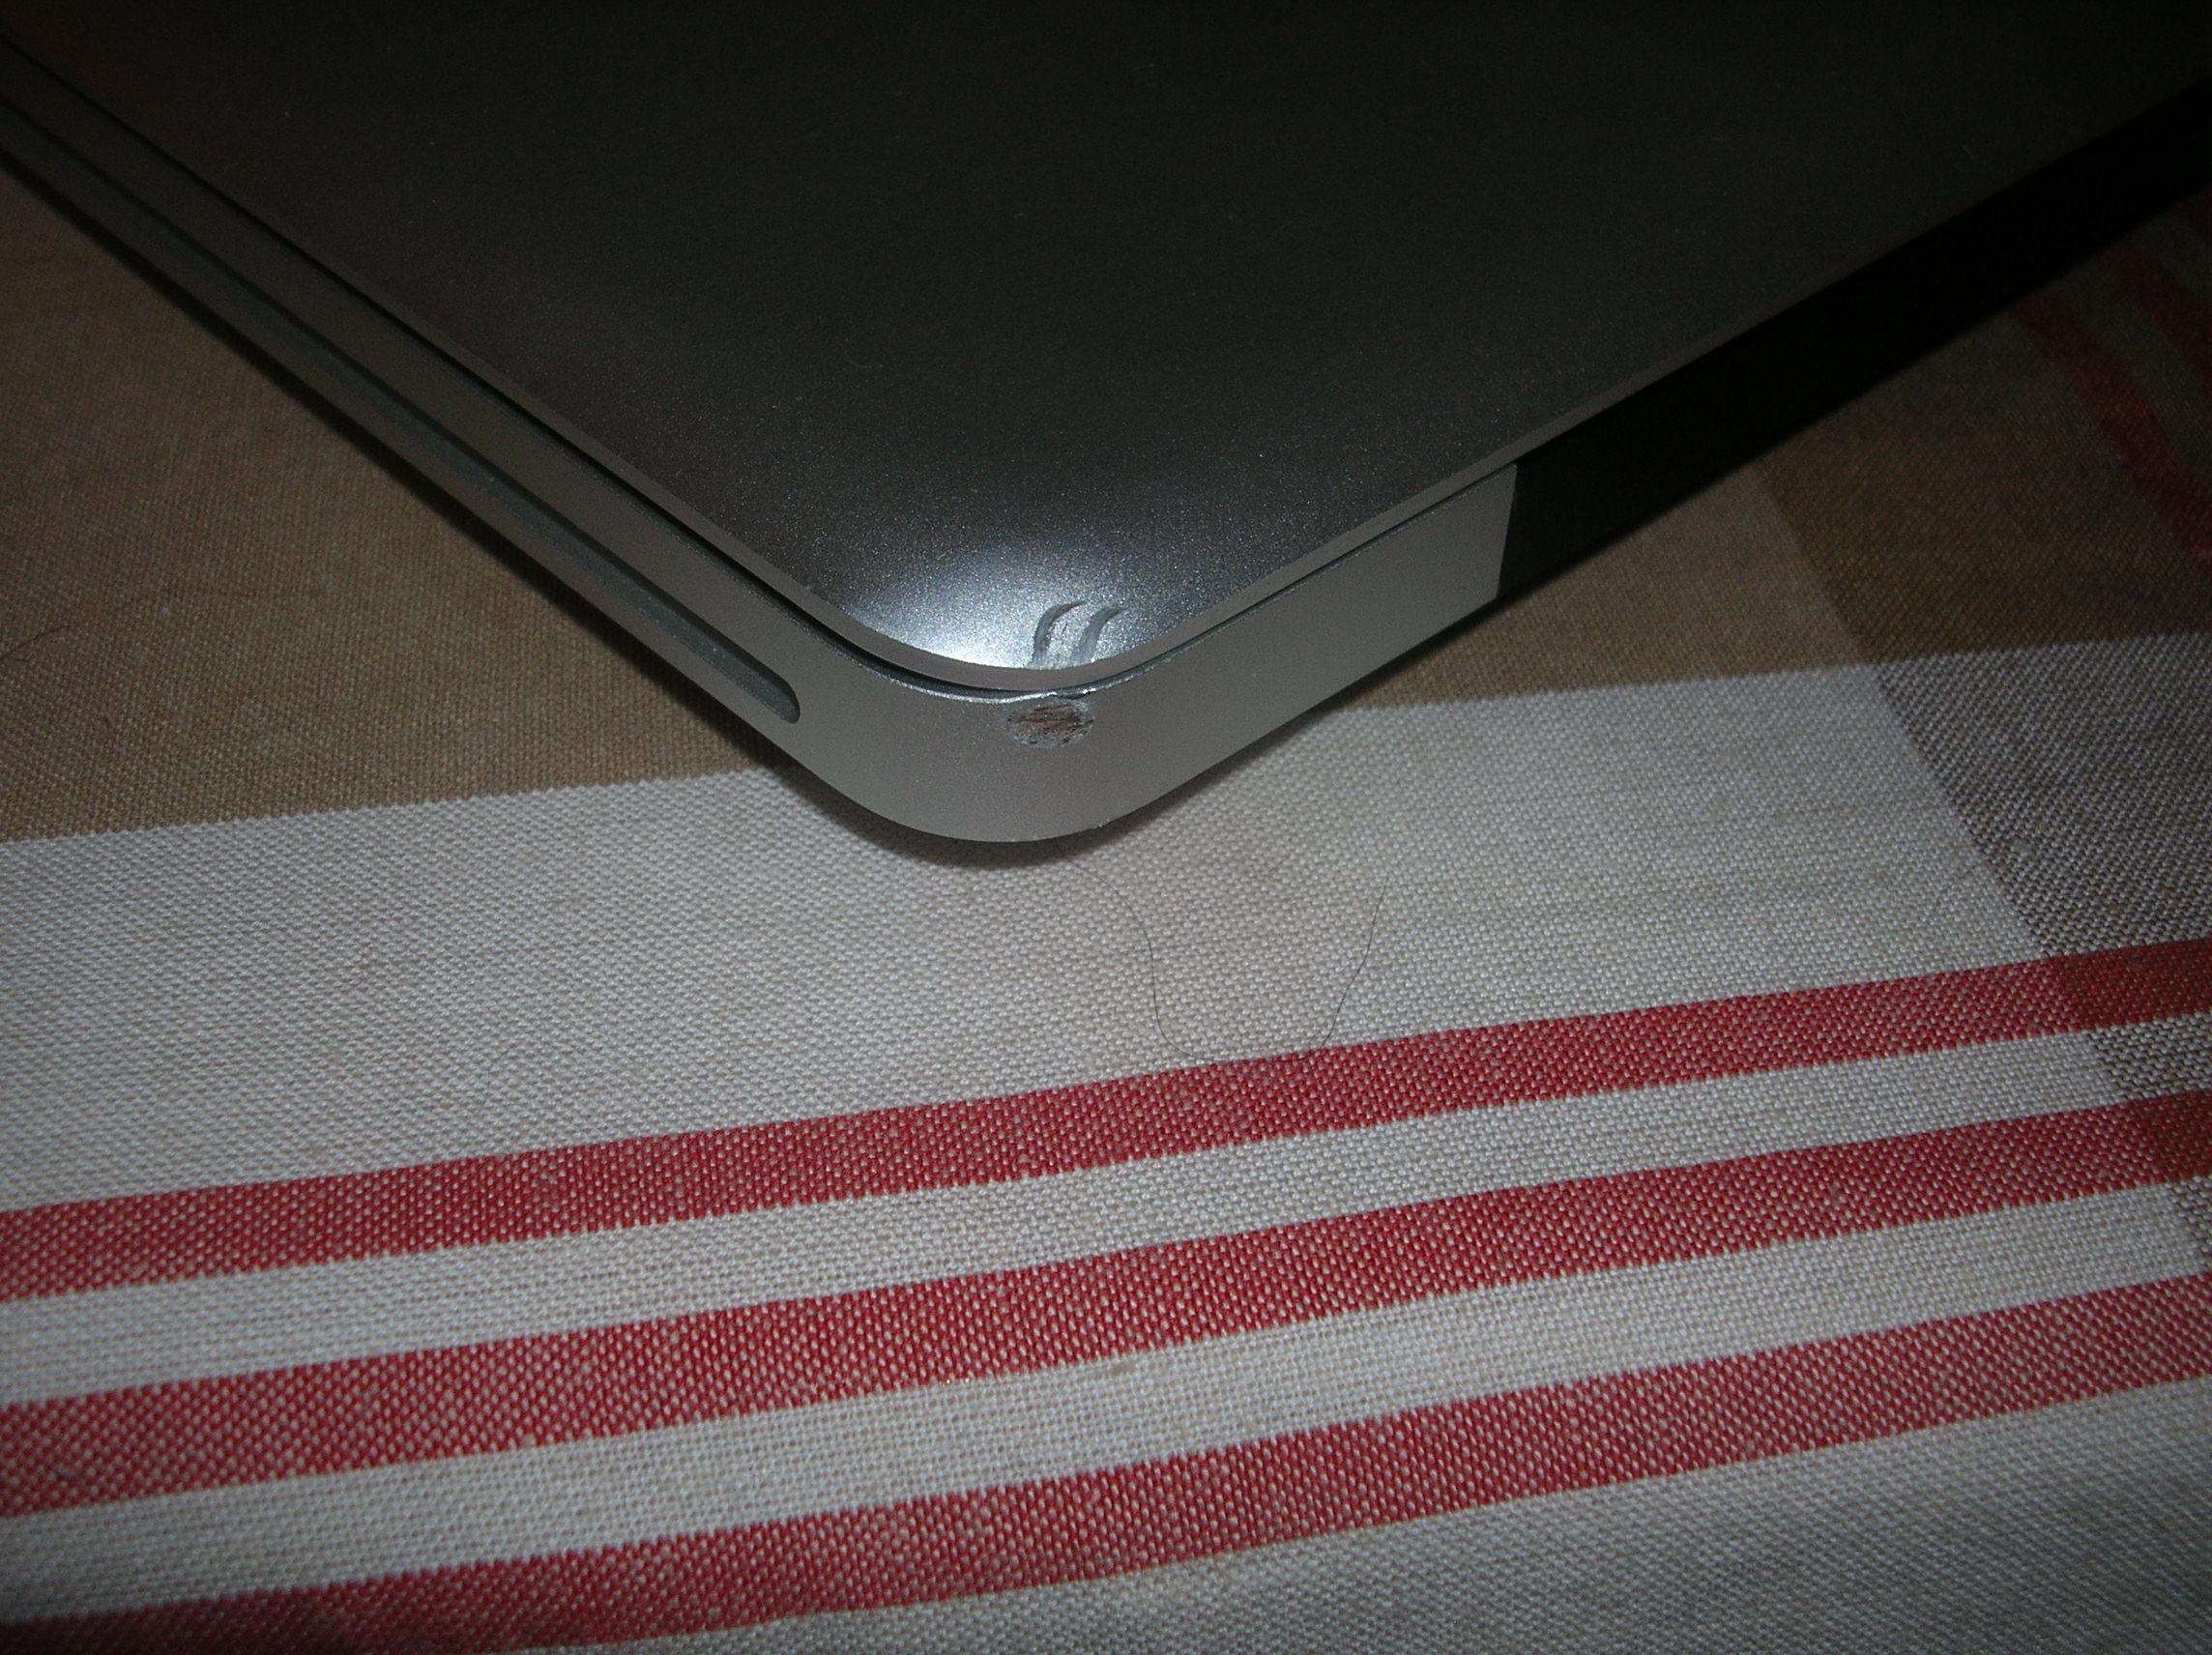 My mom Dropped my MacBook Pro | MacRumors Forums